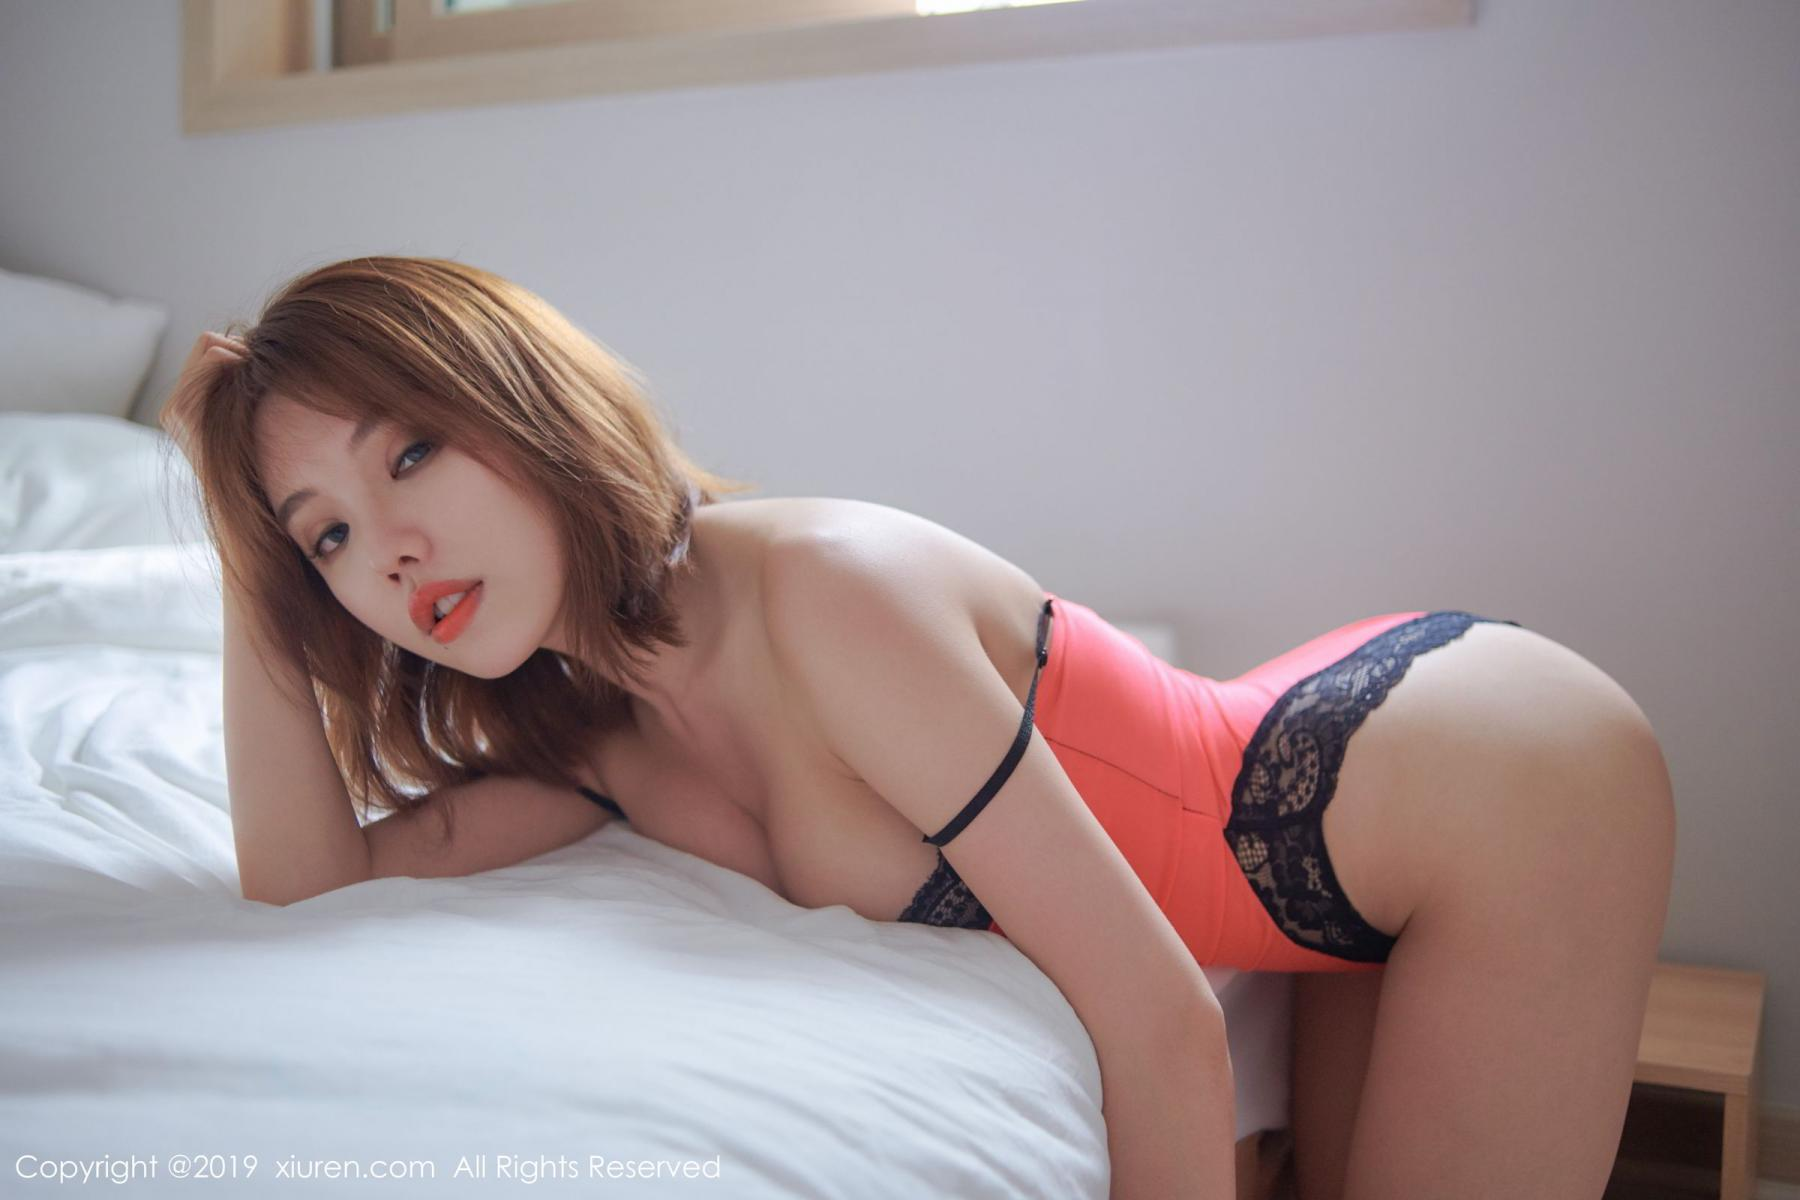 [XiuRen] Vol.1684 Huang Le Ran 46P, Huang Le Ran, Underwear, Xiuren